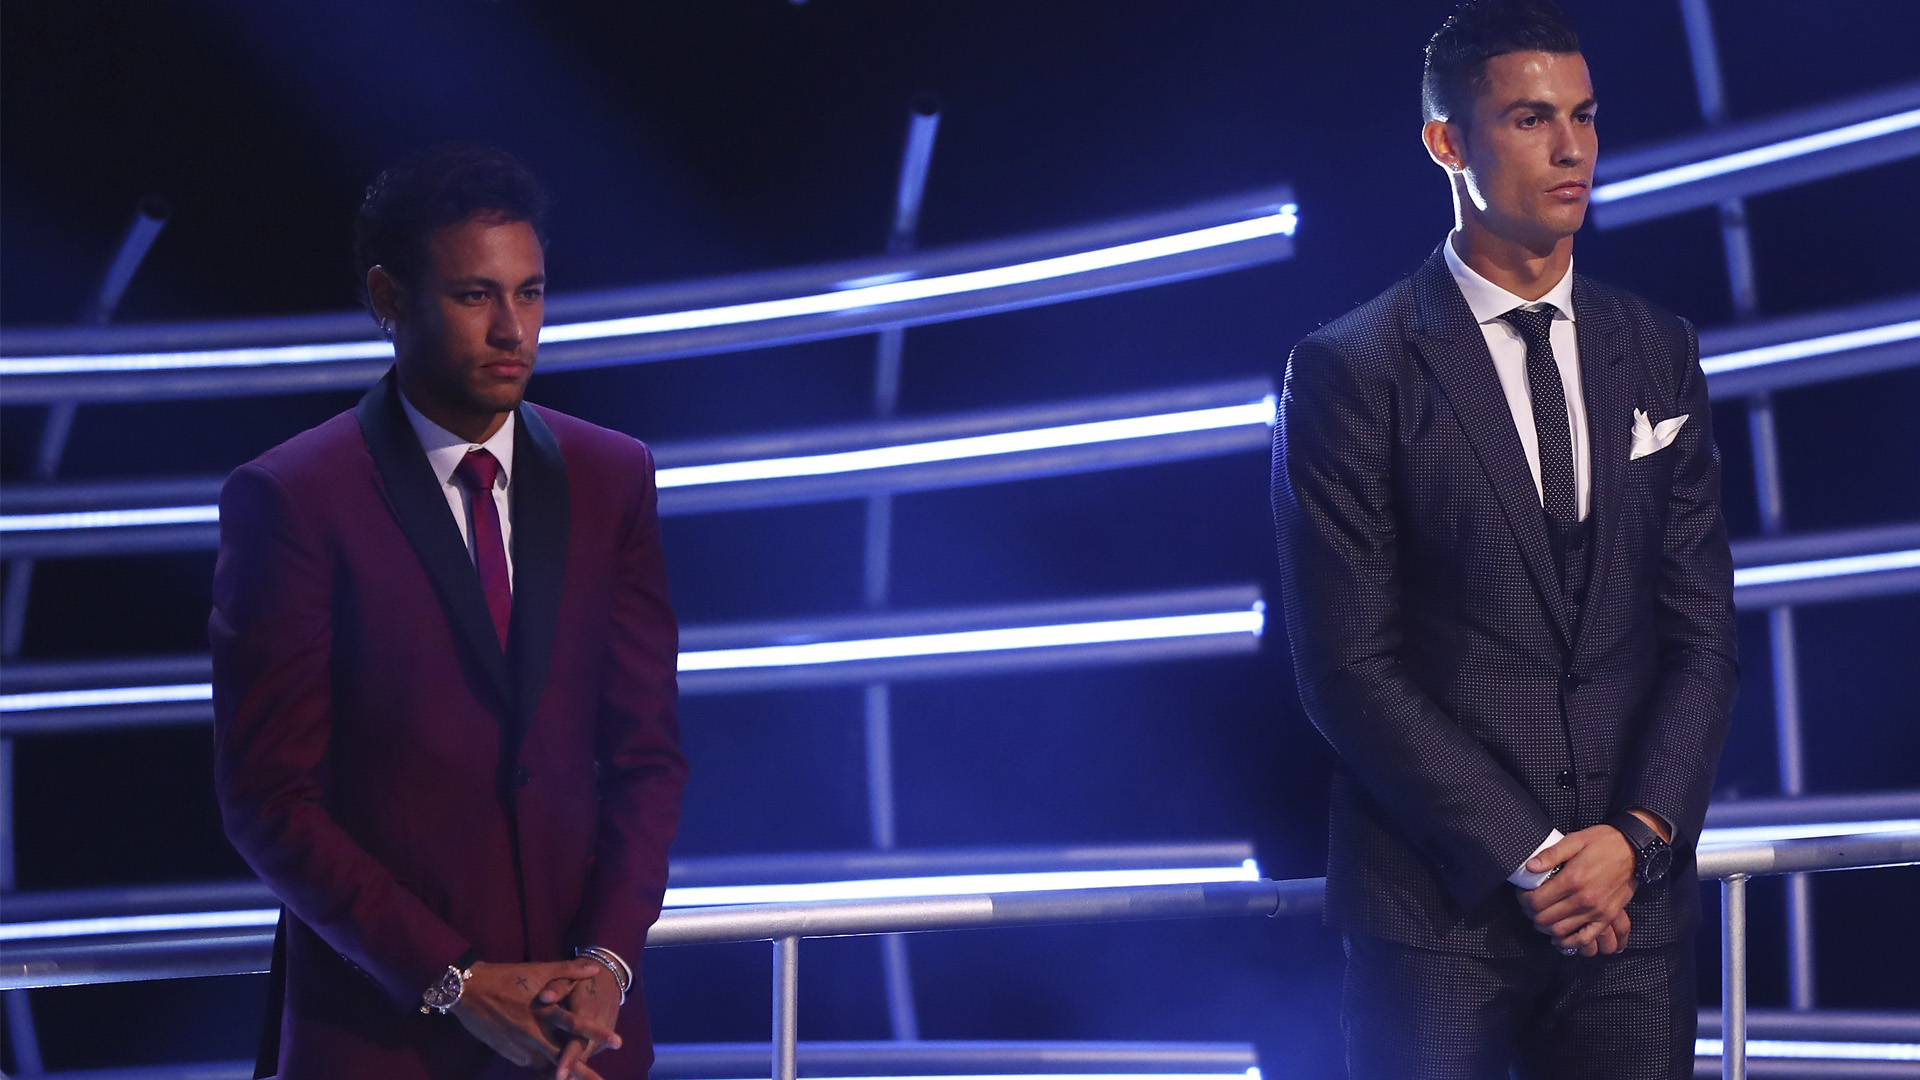 Neymar e Cristiano Ronaldo prêmio The Best 2017 23 10 17